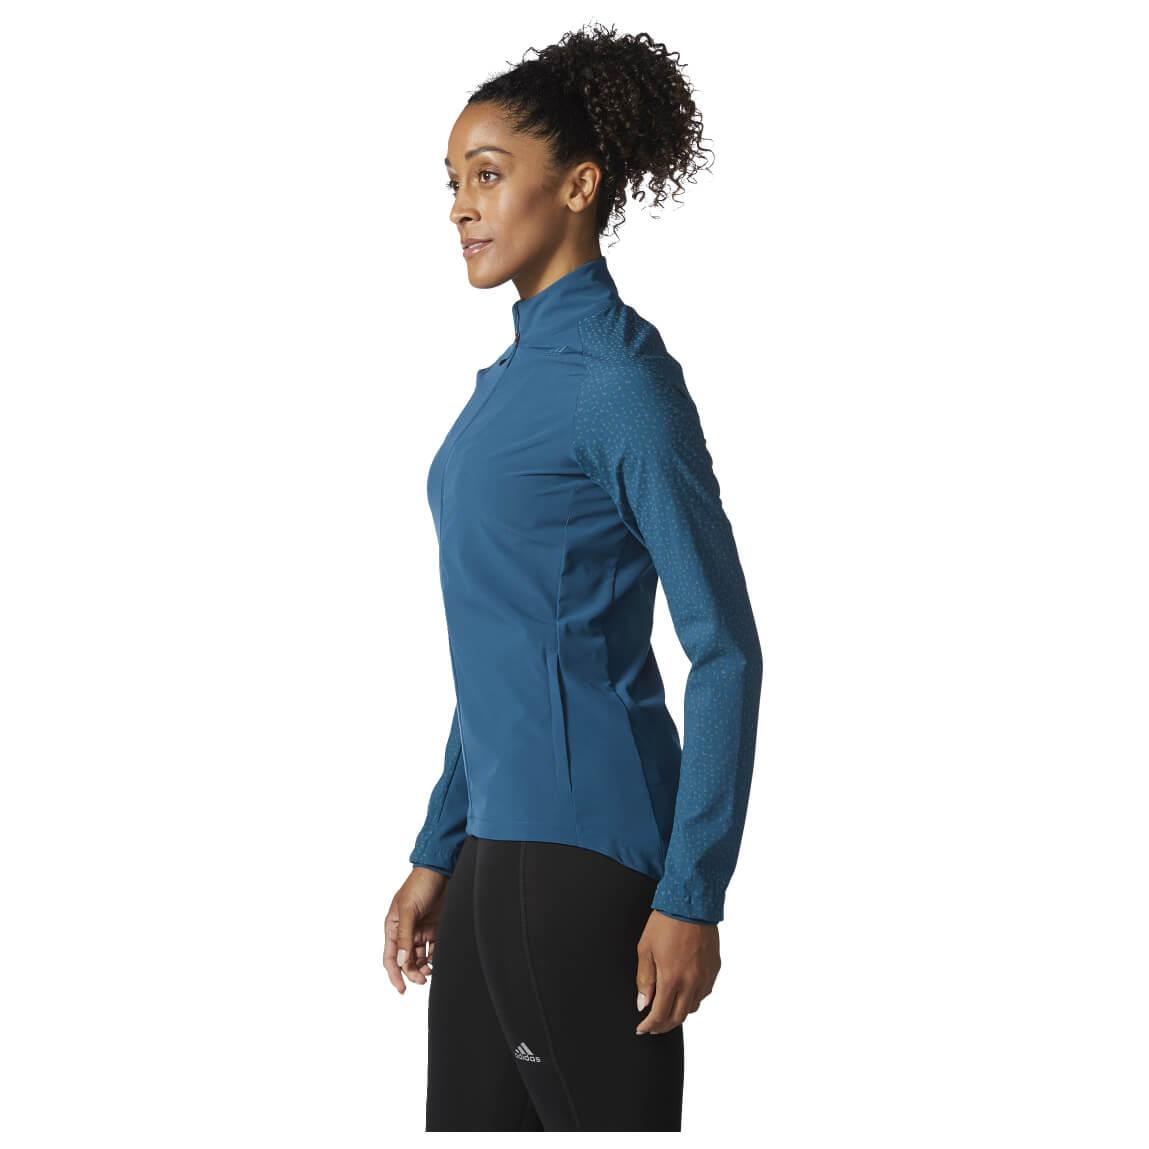 adidas Womens Running Supernova Storm Jacket Clothing Women